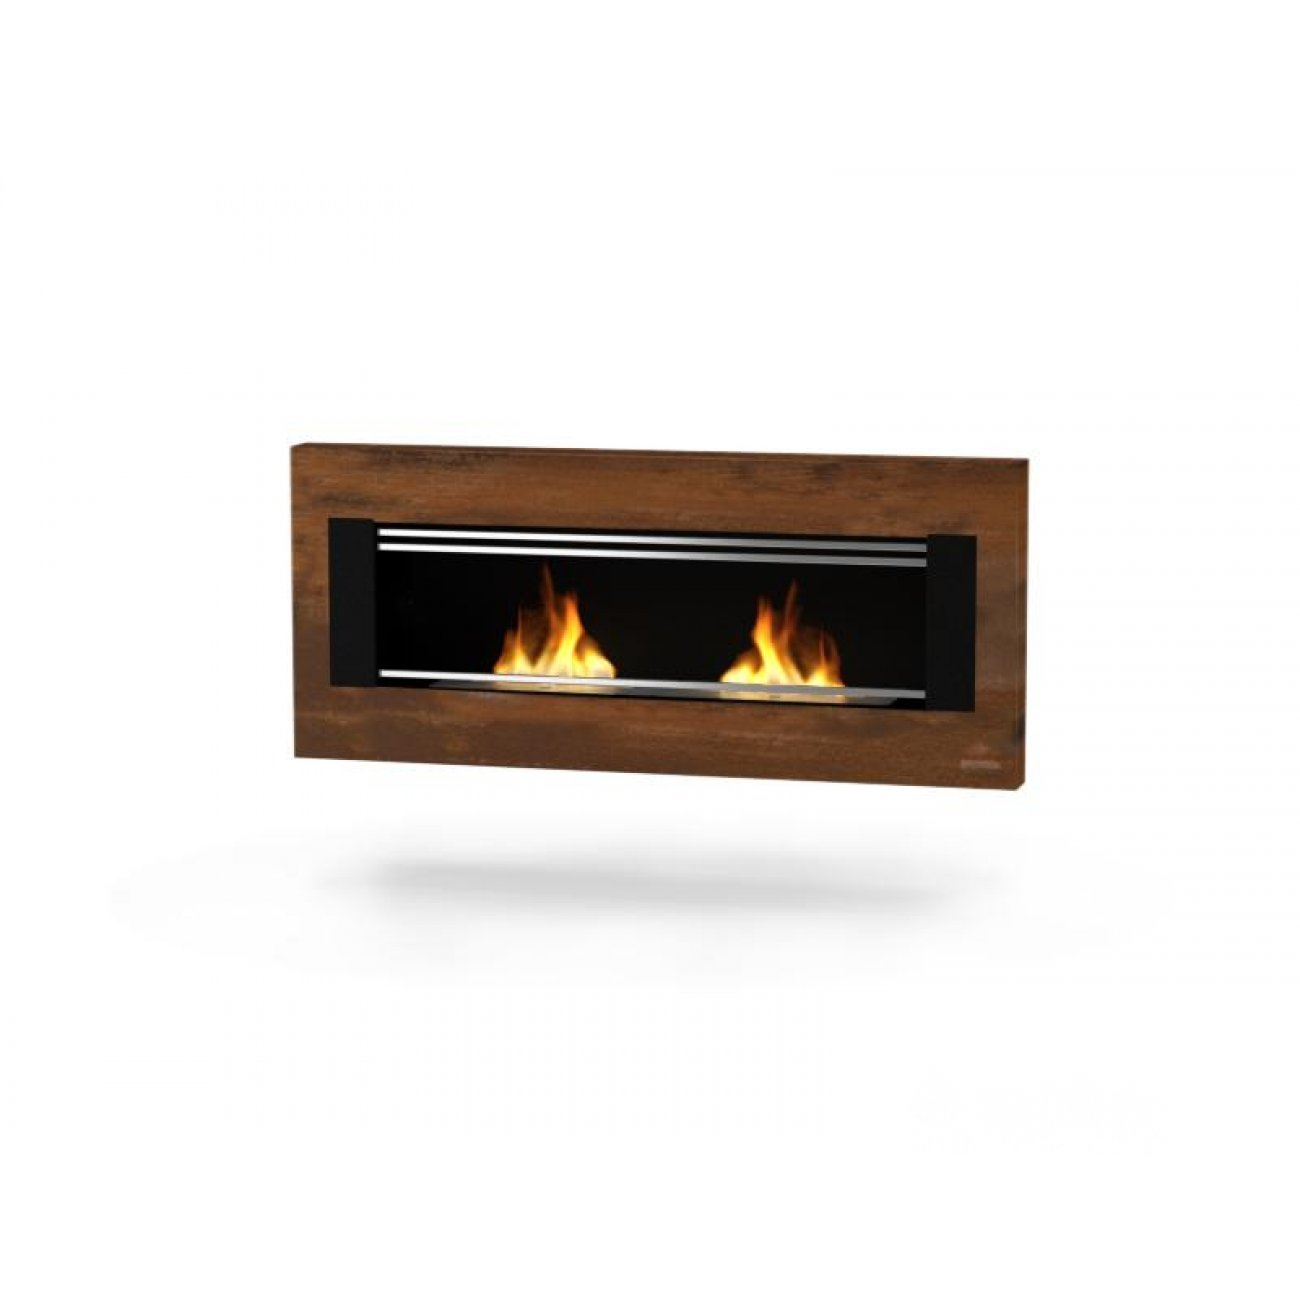 glammfire bioethanol wandkamin mito. Black Bedroom Furniture Sets. Home Design Ideas